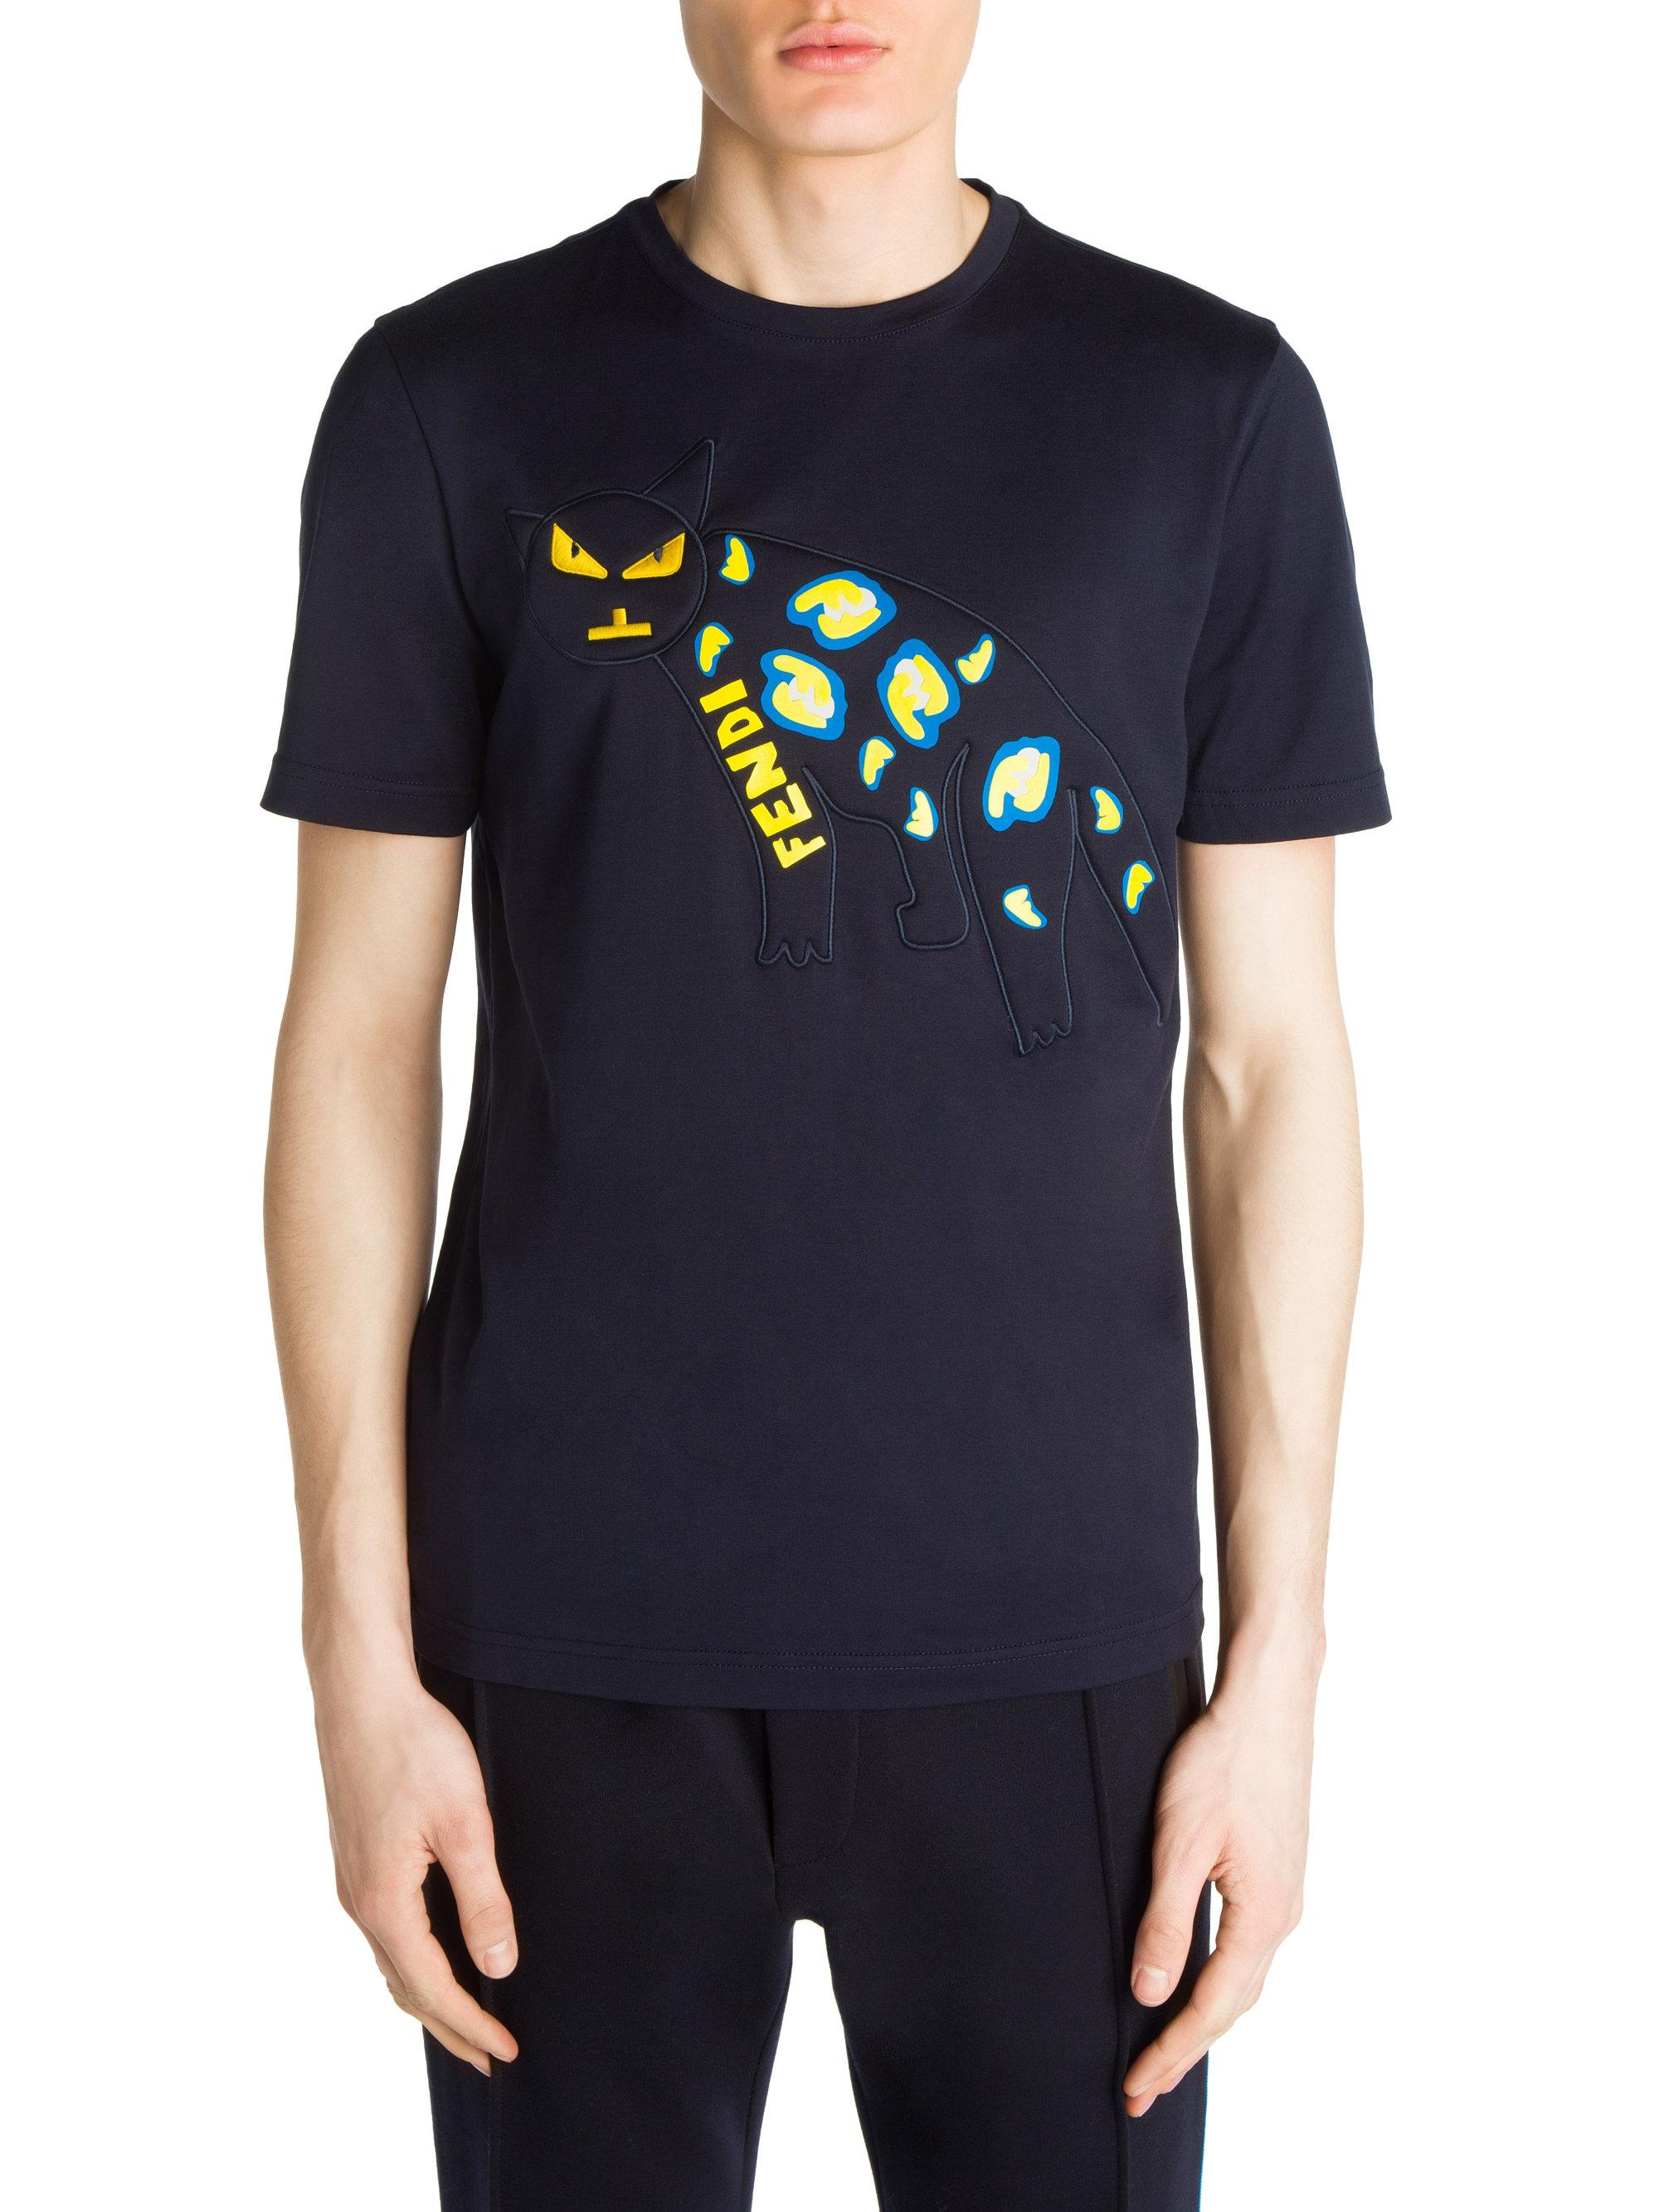 t product my one jaguar wild spgwvl ahmyshirt ah shirts gift shirt cla animal gifts